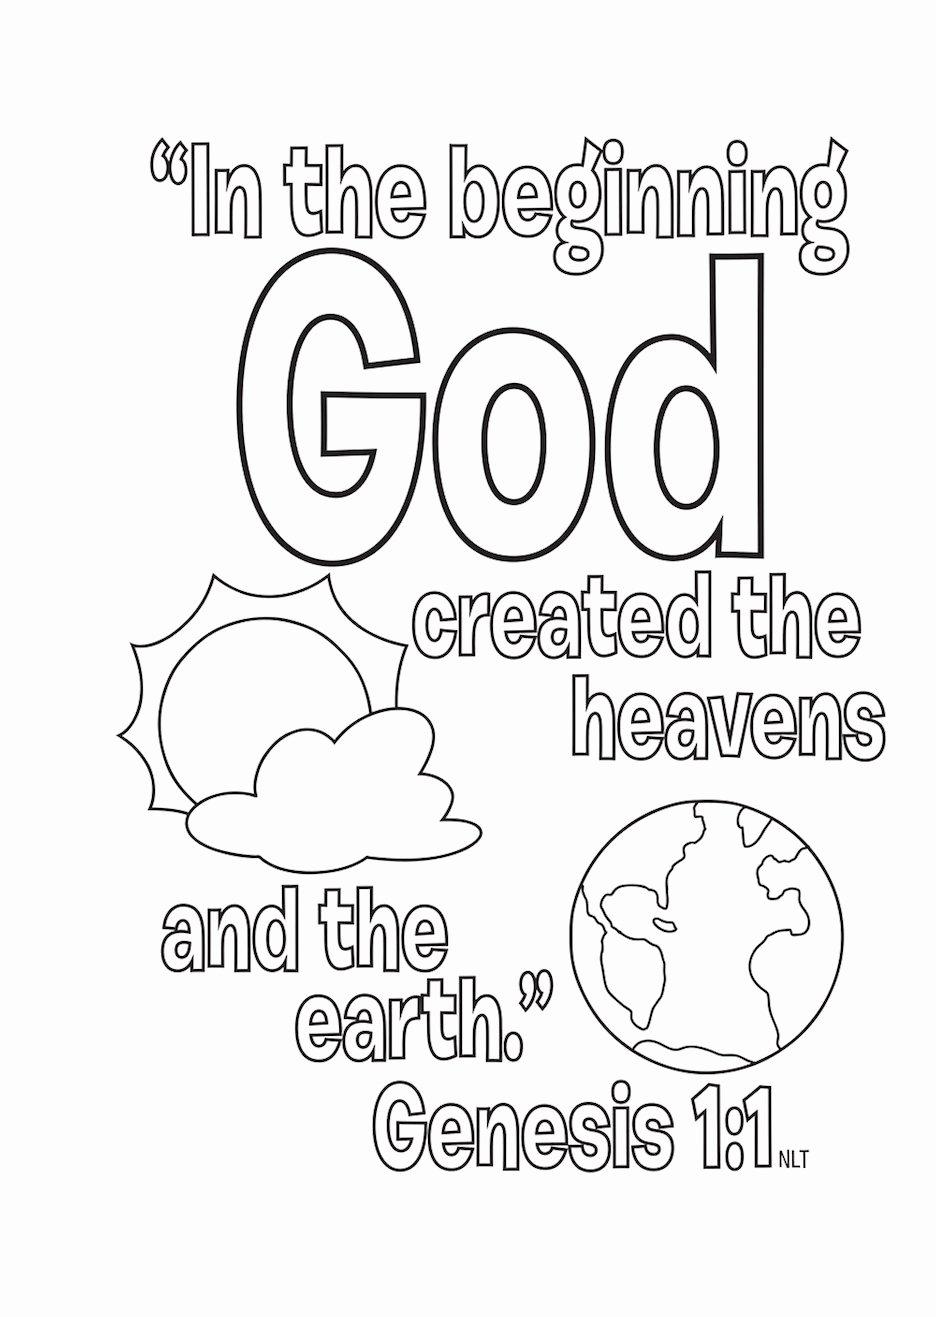 Bible Story Worksheets for Preschoolers Kids Worksheet Free Bible Printablesy for Preschoolers